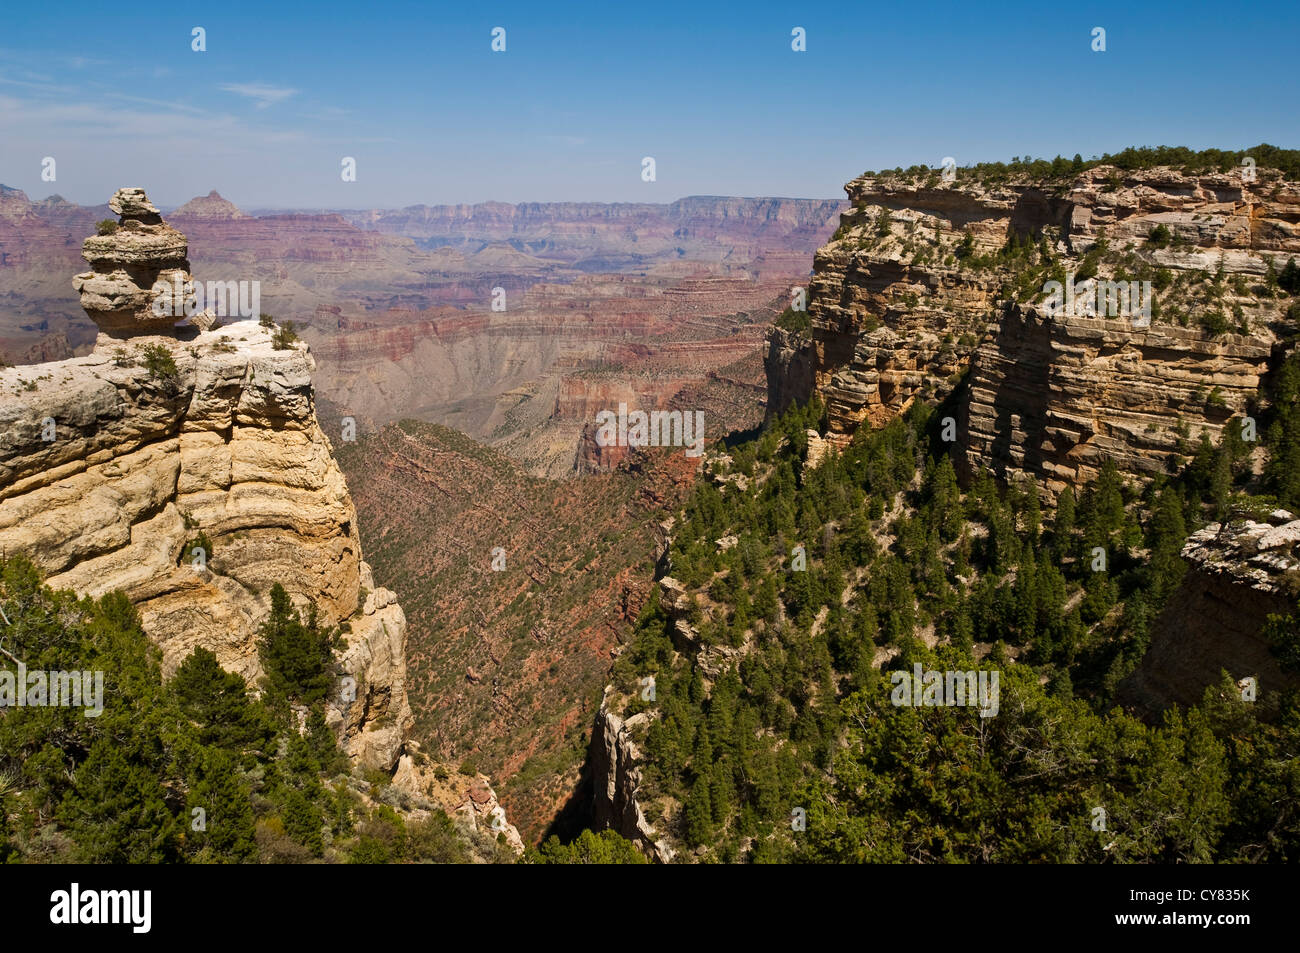 Scenic view of layered rocks along the South Rim, Grand Canyon National Park, Arizona Stock Photo